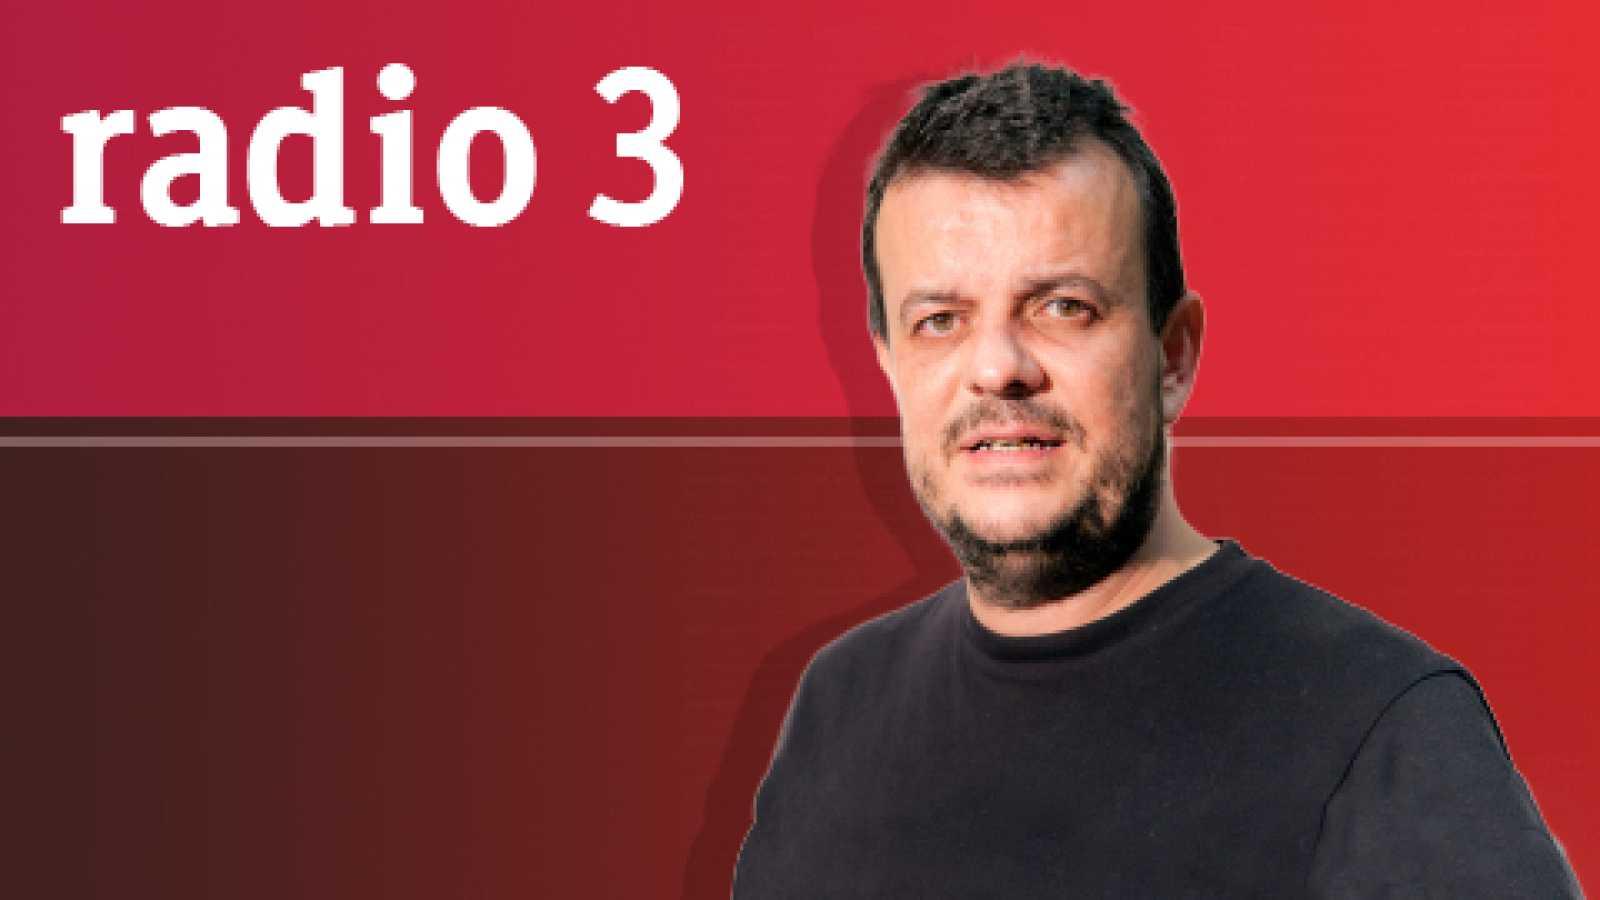 Sateli 3 - Especial: Nostalgia 77 And The Monster (2012-2014) - 16/03/21 - escuchar ahora